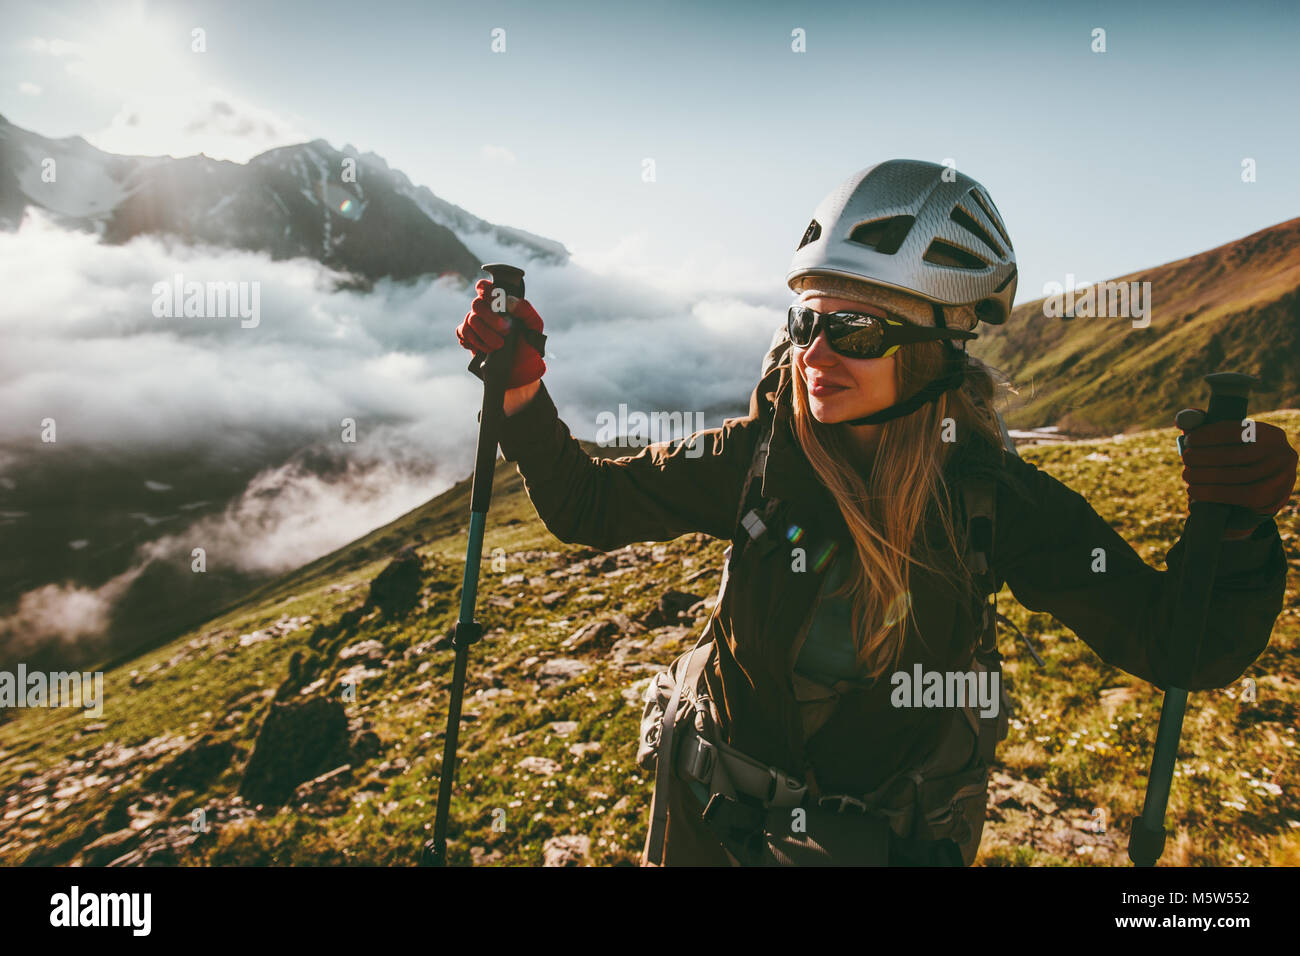 Glückliche Frau genießen Berge Landschaft sunset Travel gesunder Lebensstil Abenteuer Konzept Aktiv Sommer Stockbild